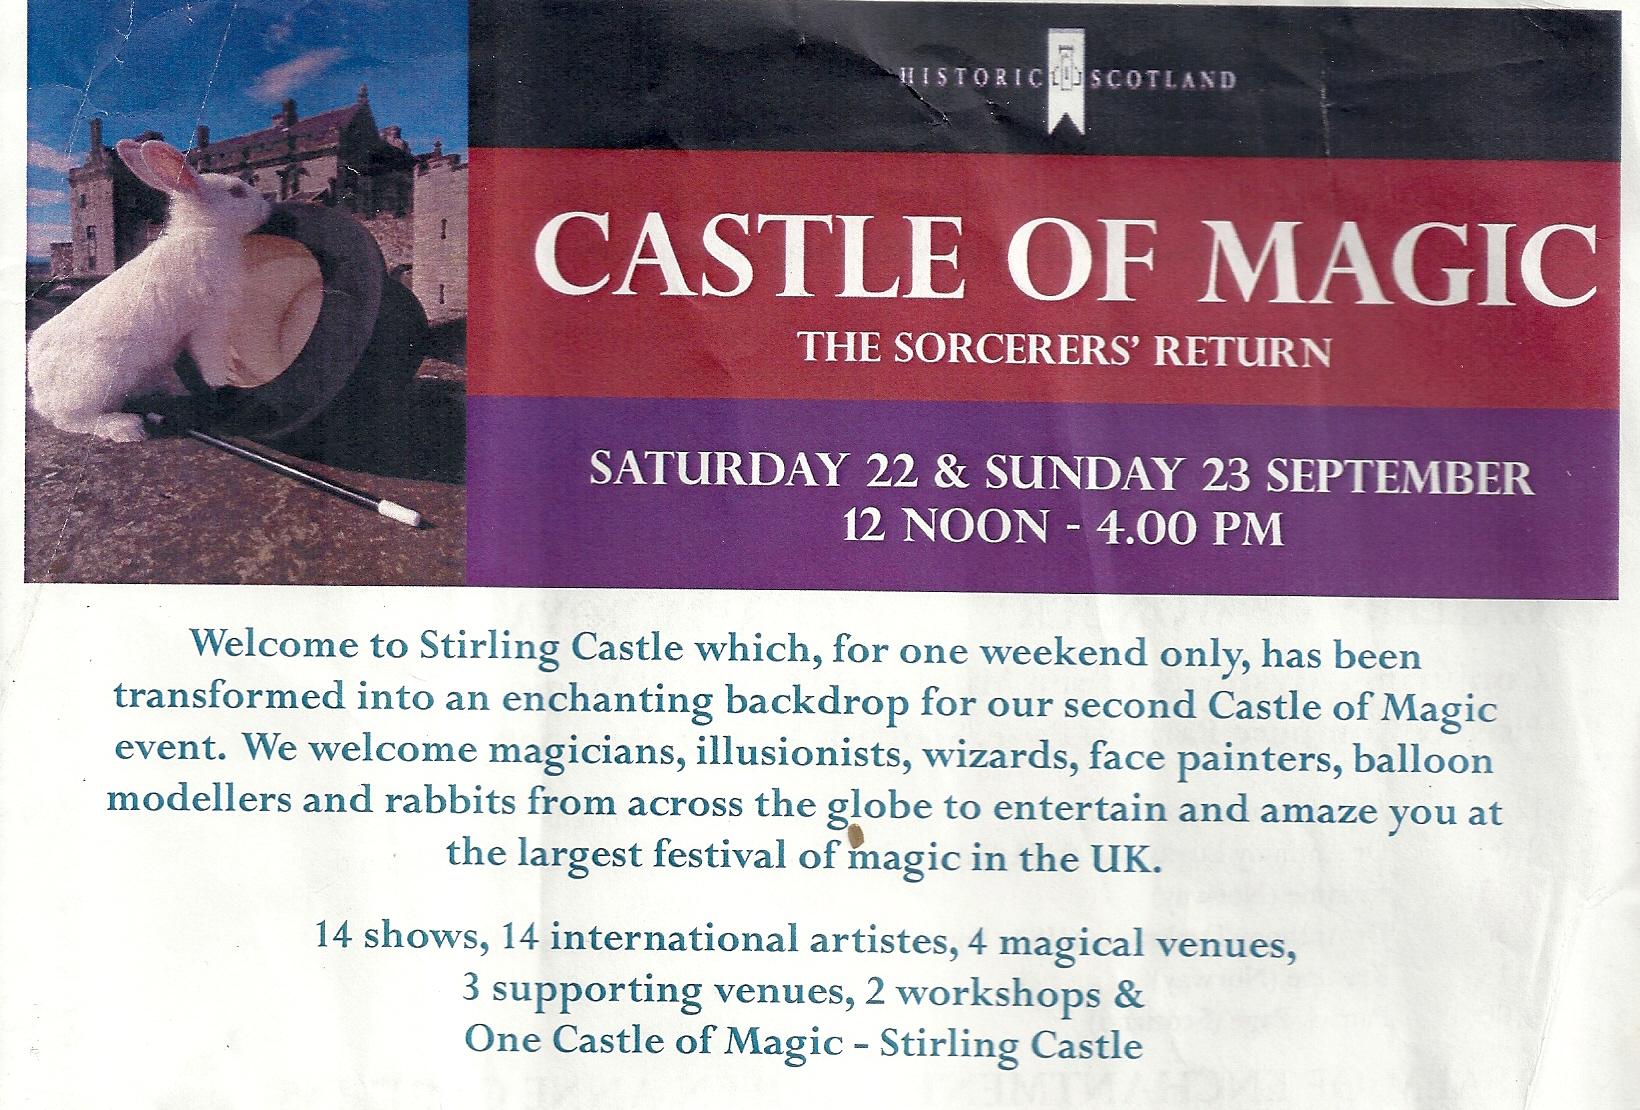 Castle of Magic Sorcerers' Return